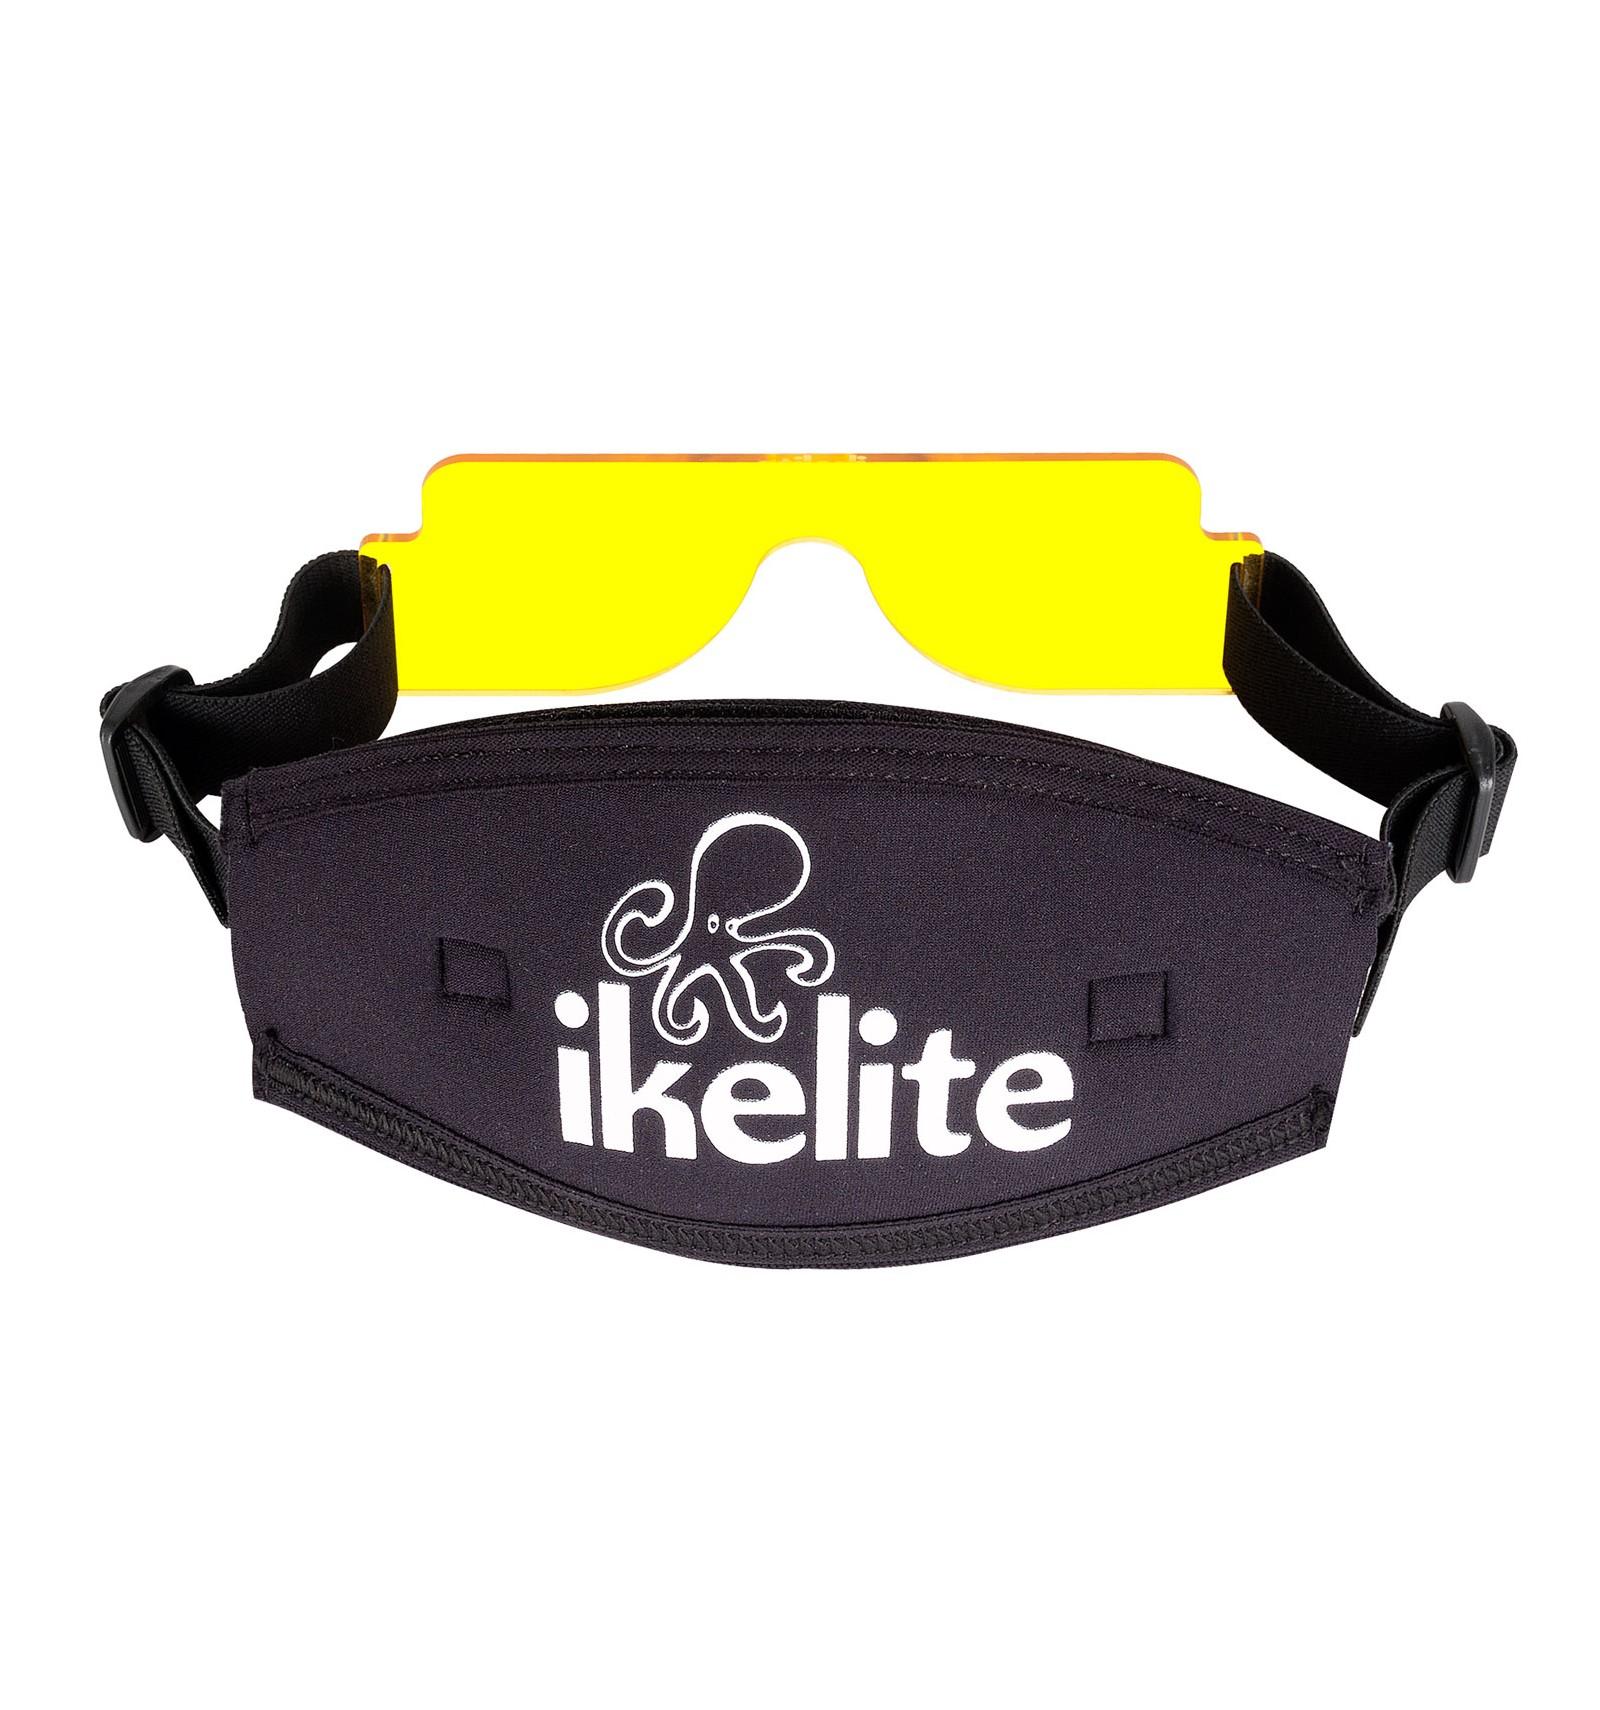 Filter 3.0 Ikelite Barrier Yellow